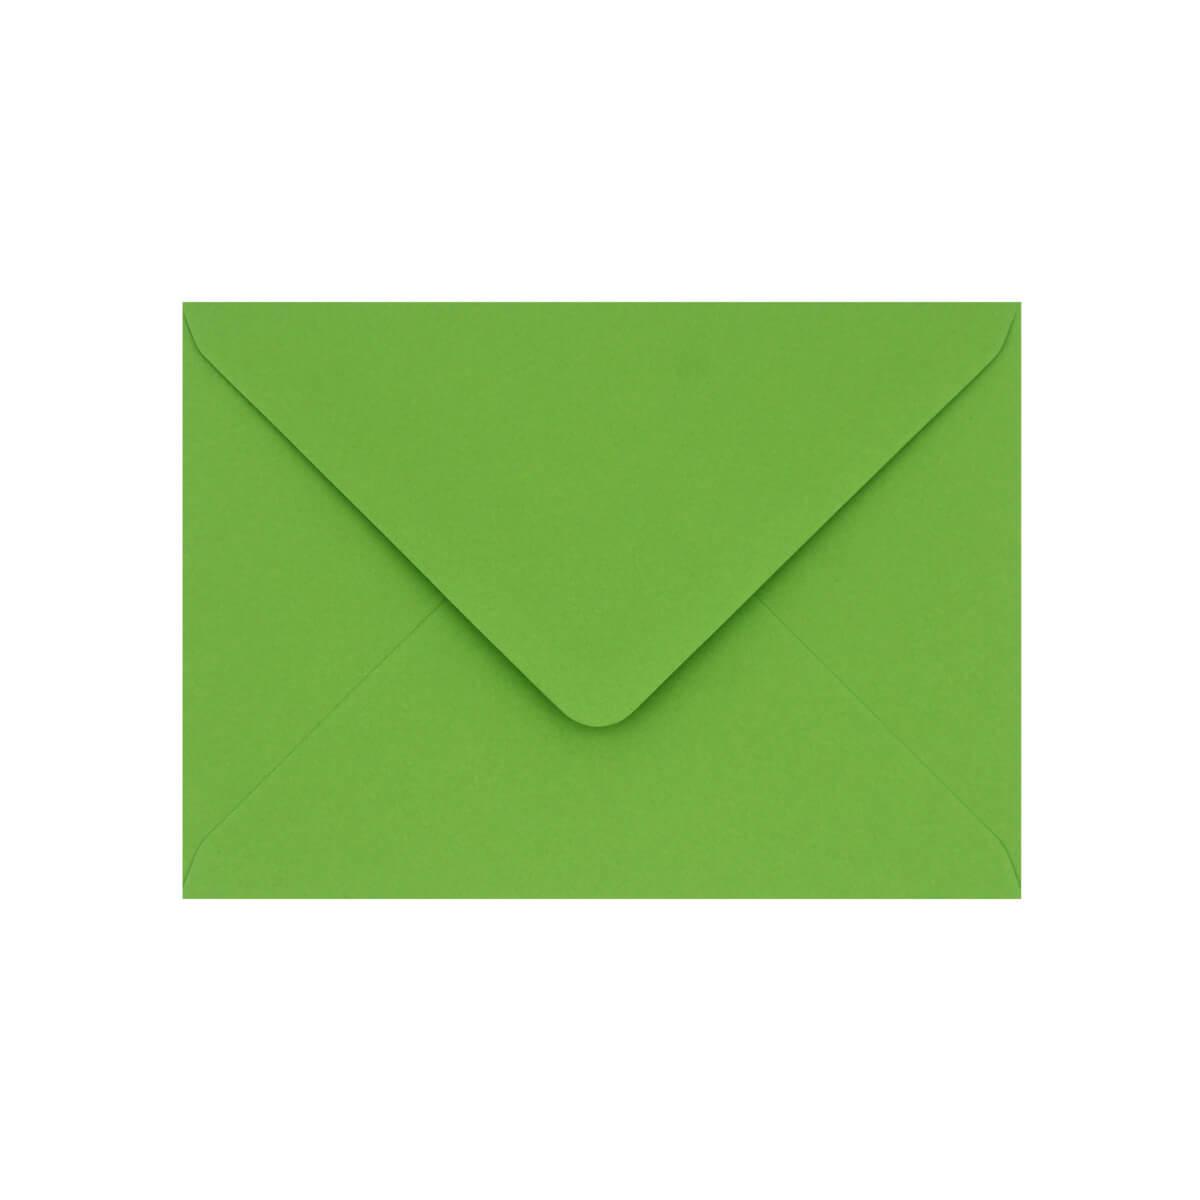 MID GREEN 125 x 175mm ENVELOPES